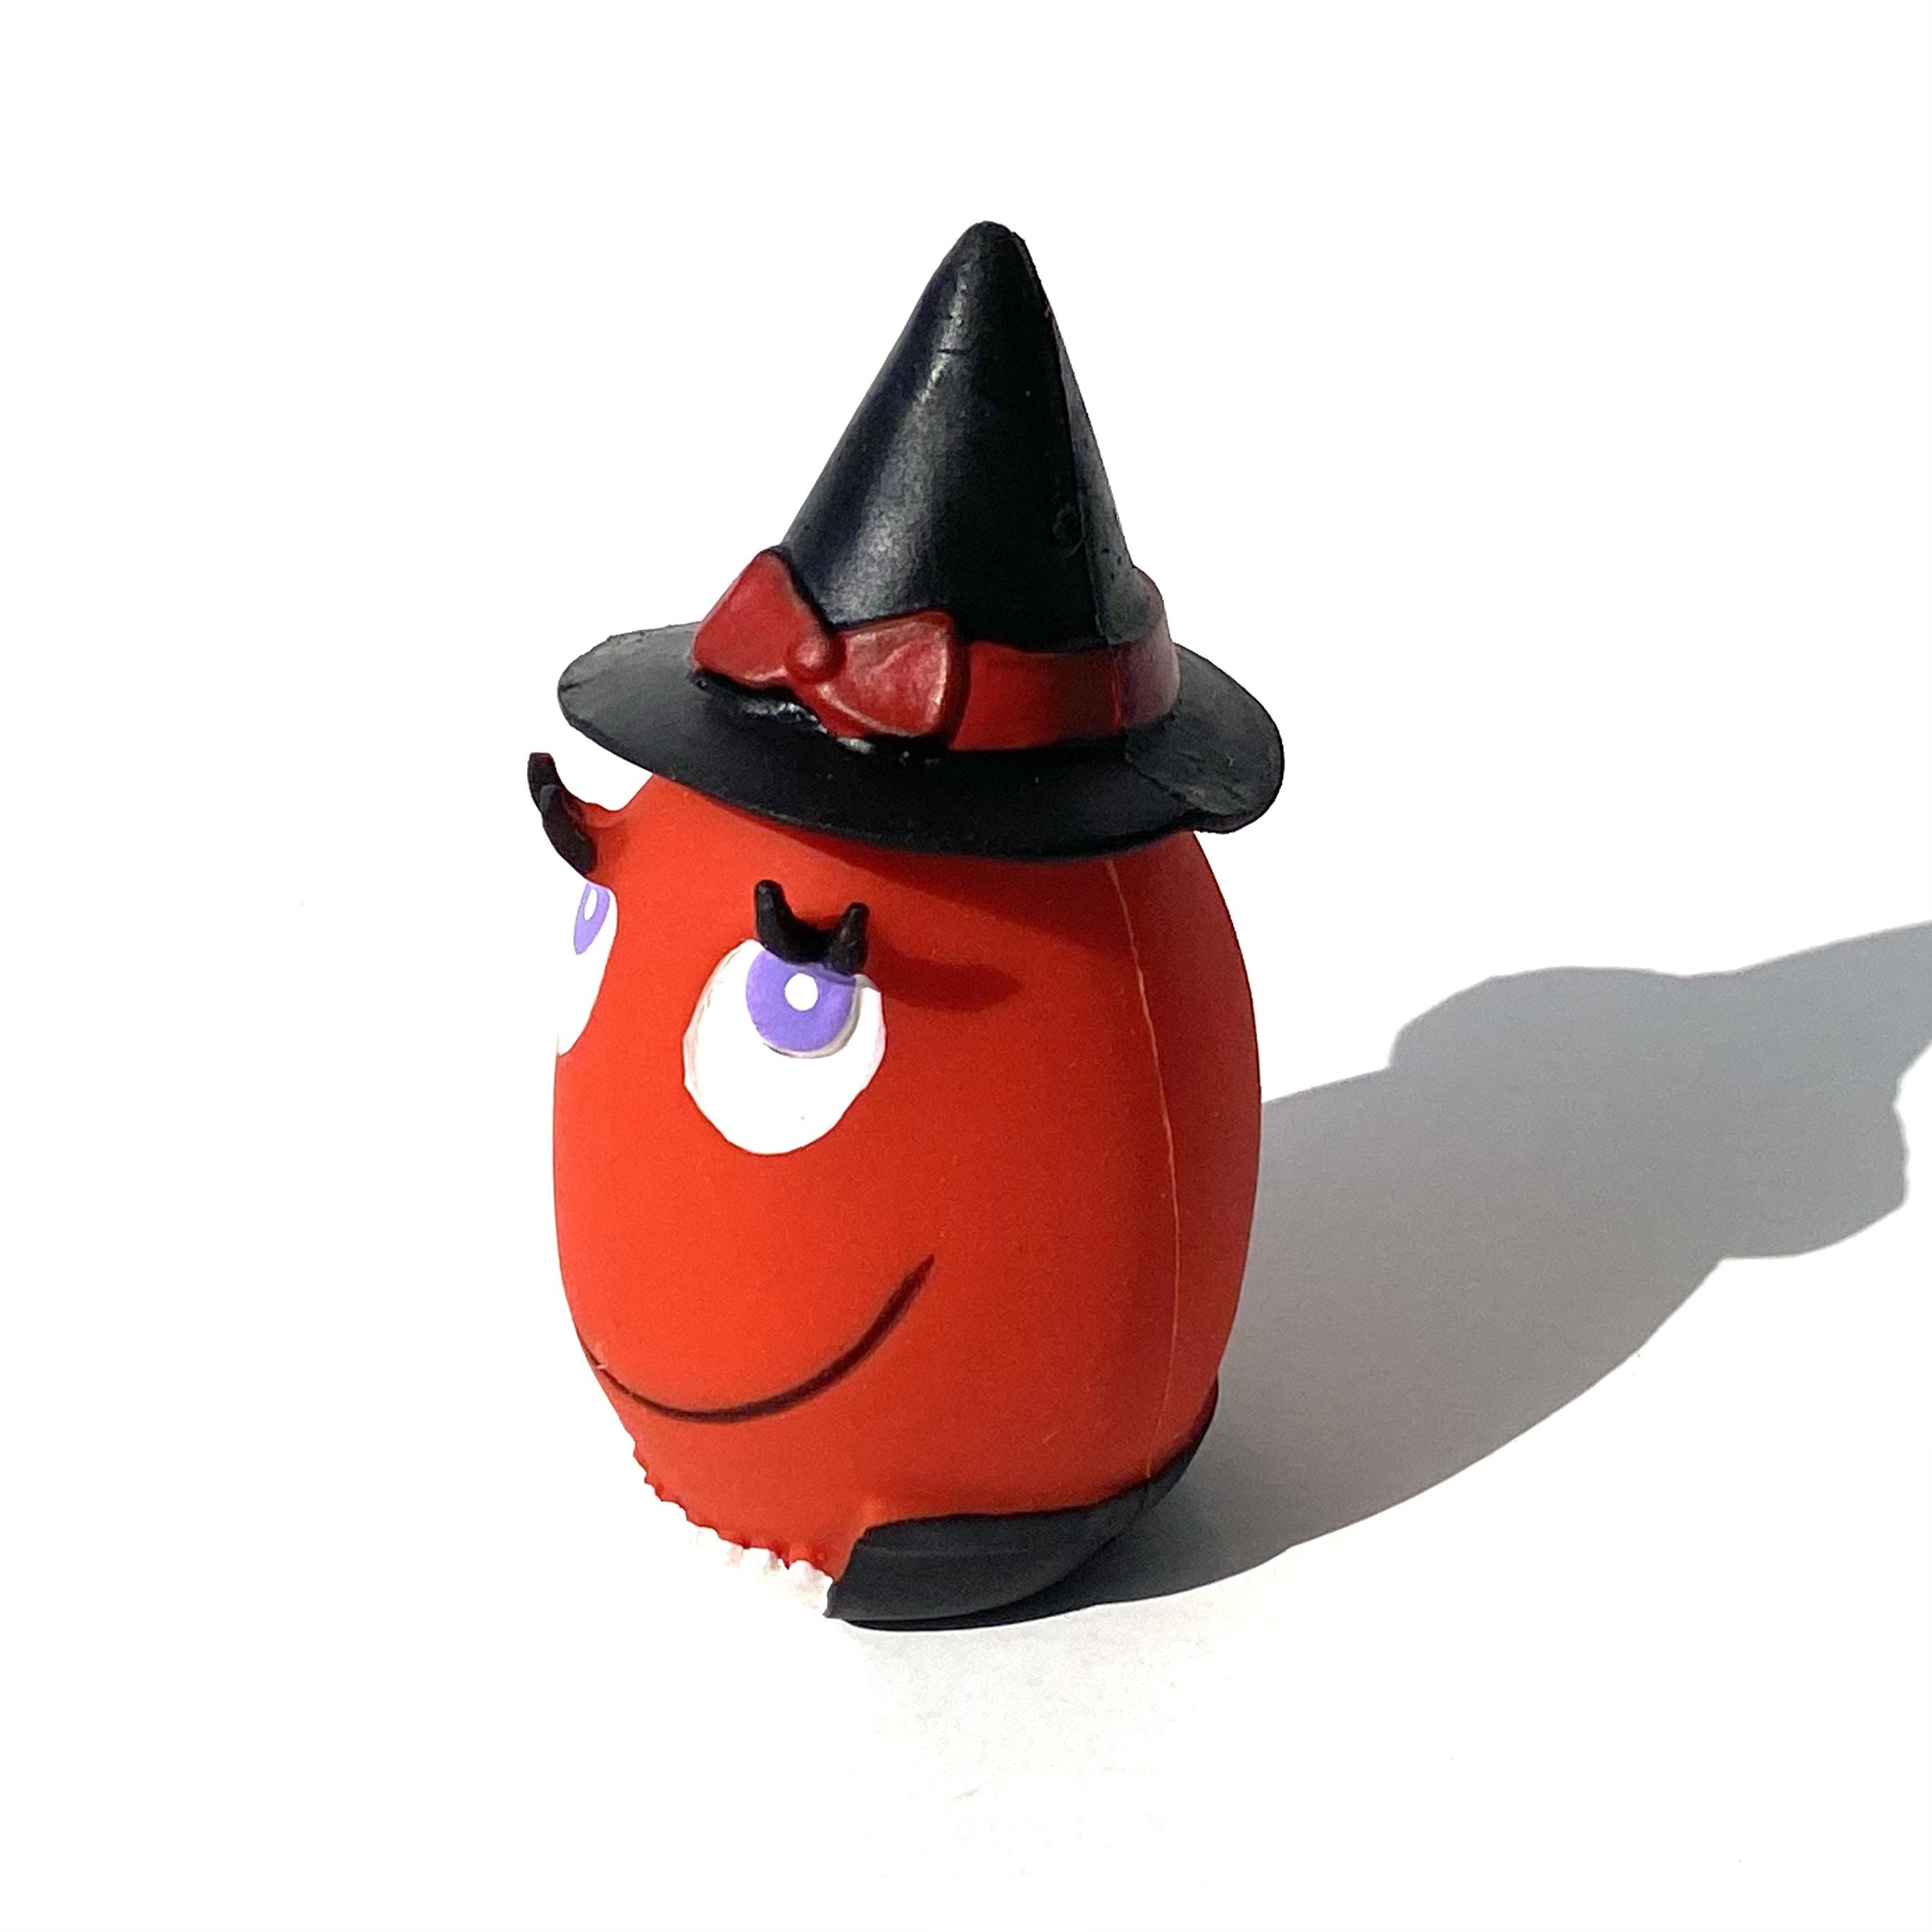 LANCO Halloween EGG  ランコ ハロウィン タマゴ_d0217958_11483801.jpeg